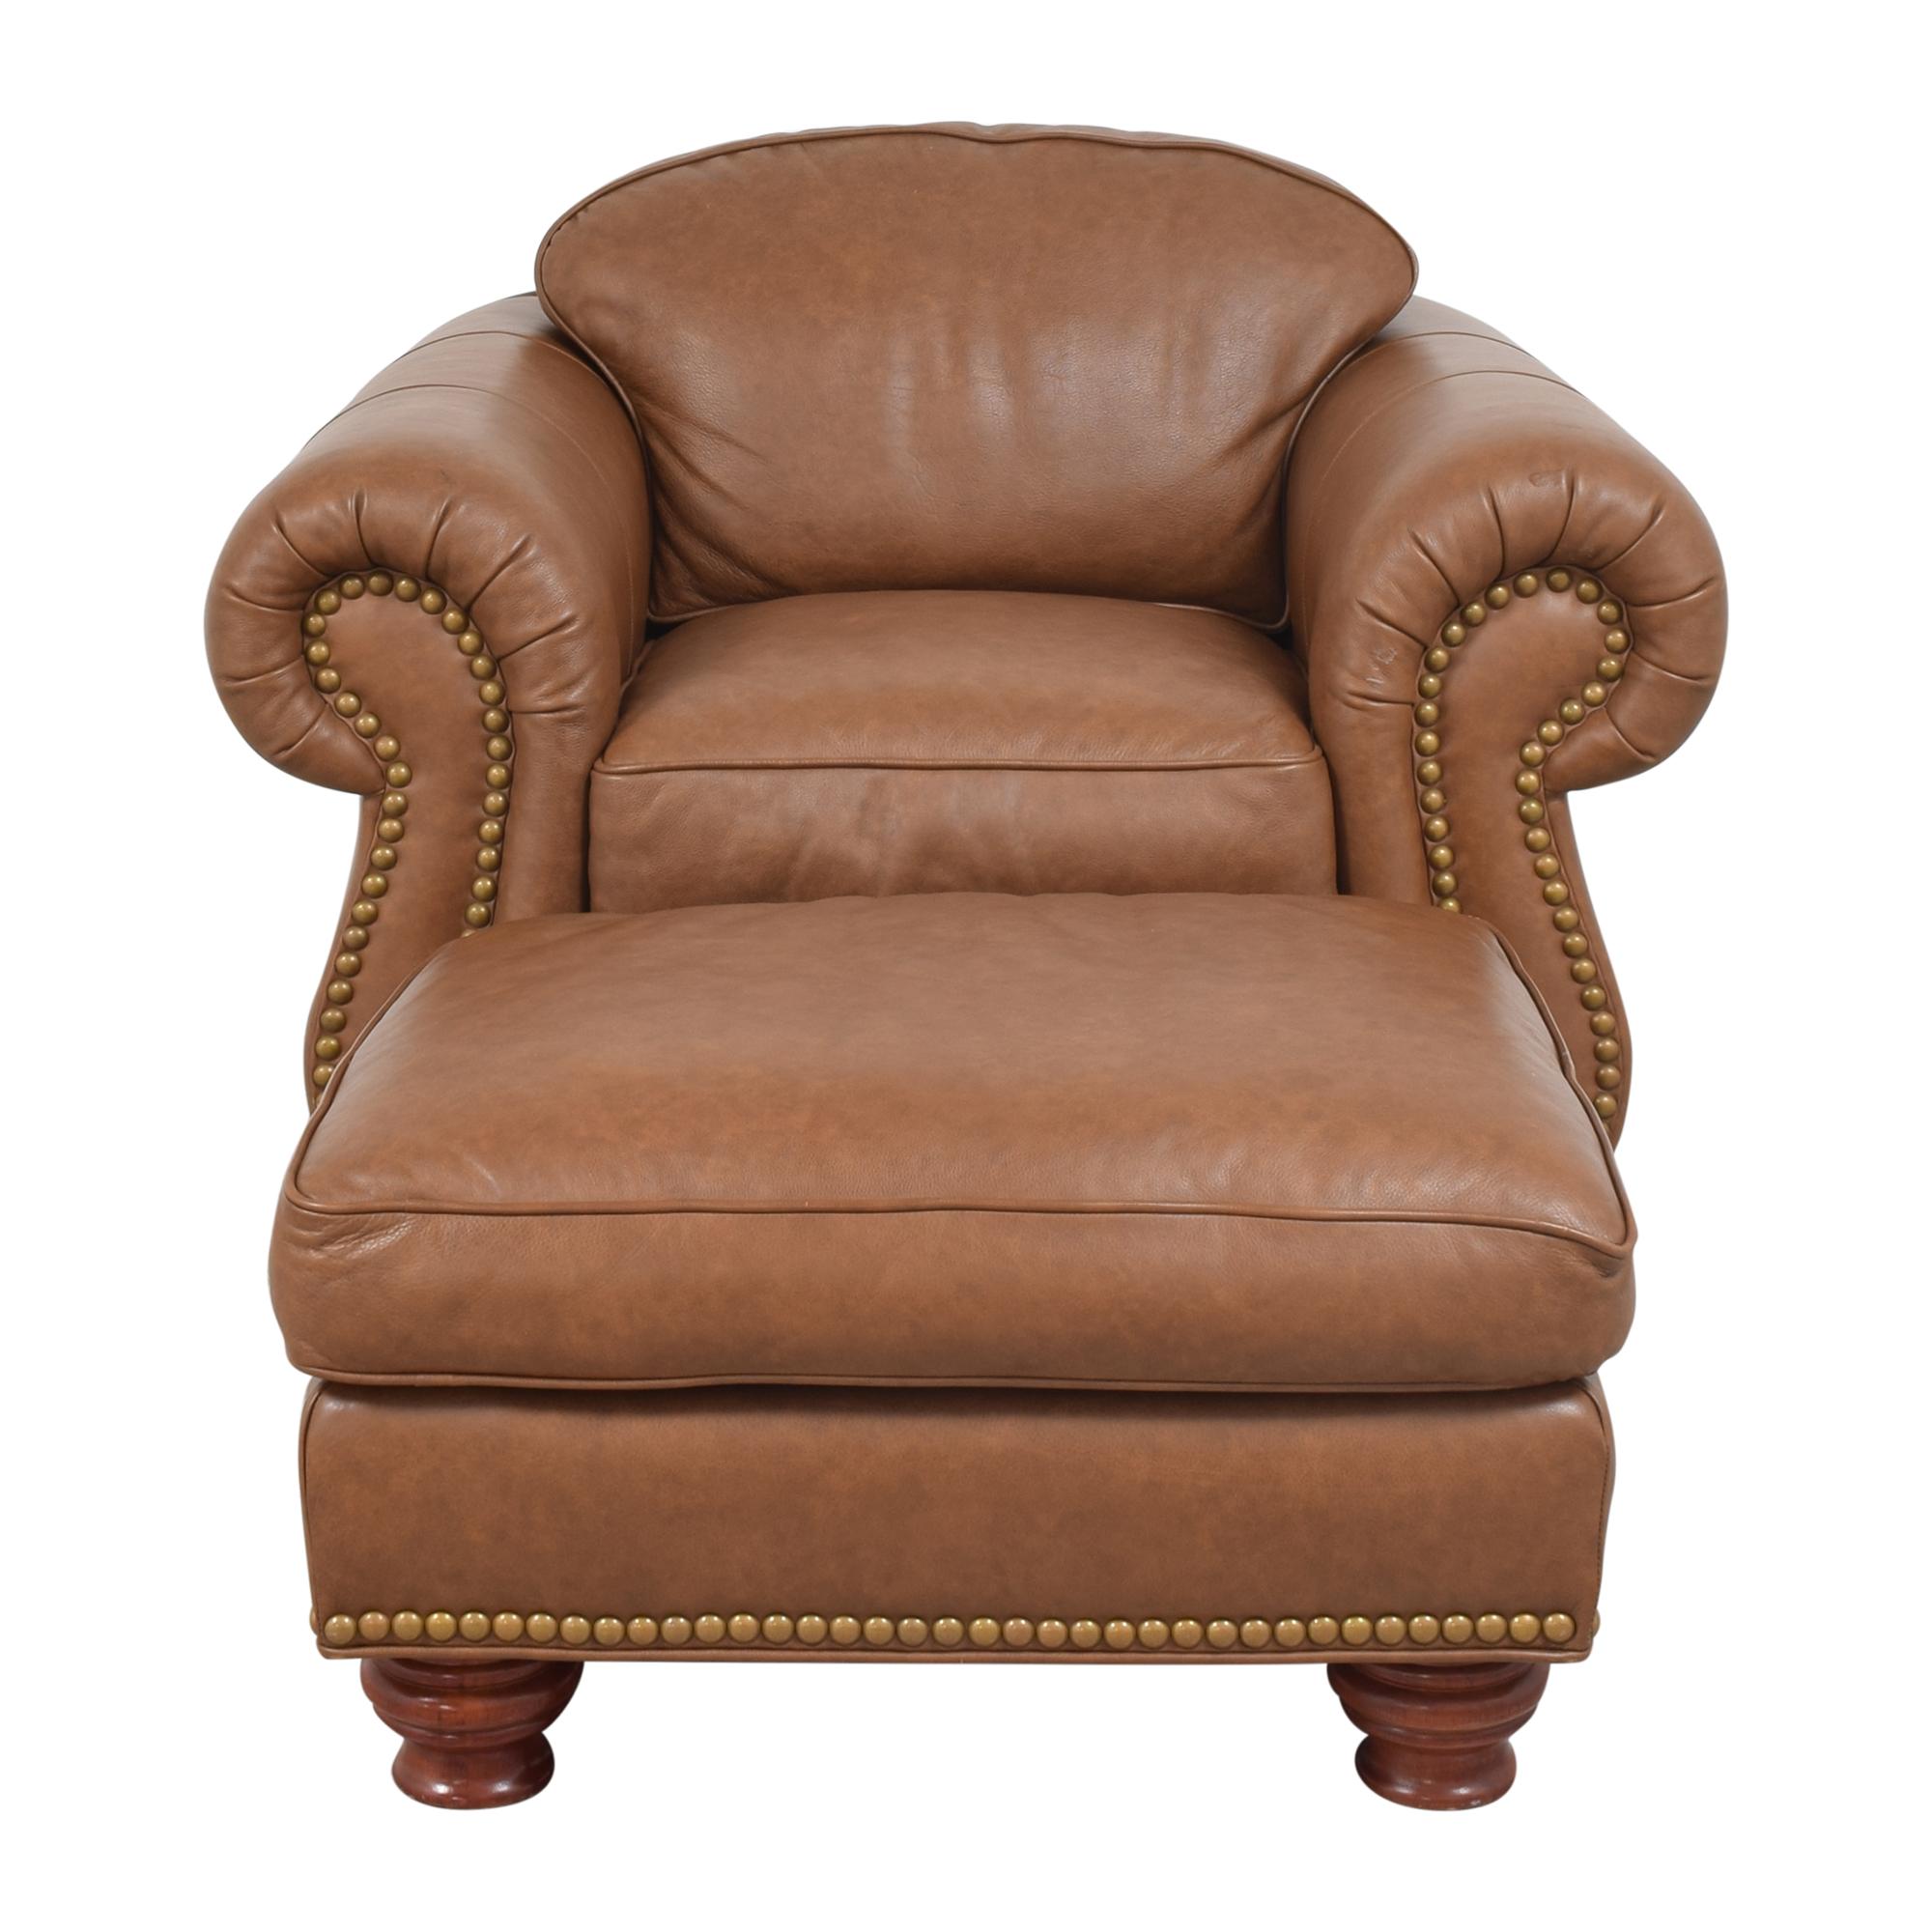 shop Thomasville Nailhead Club Chair with Ottoman Thomasville Chairs